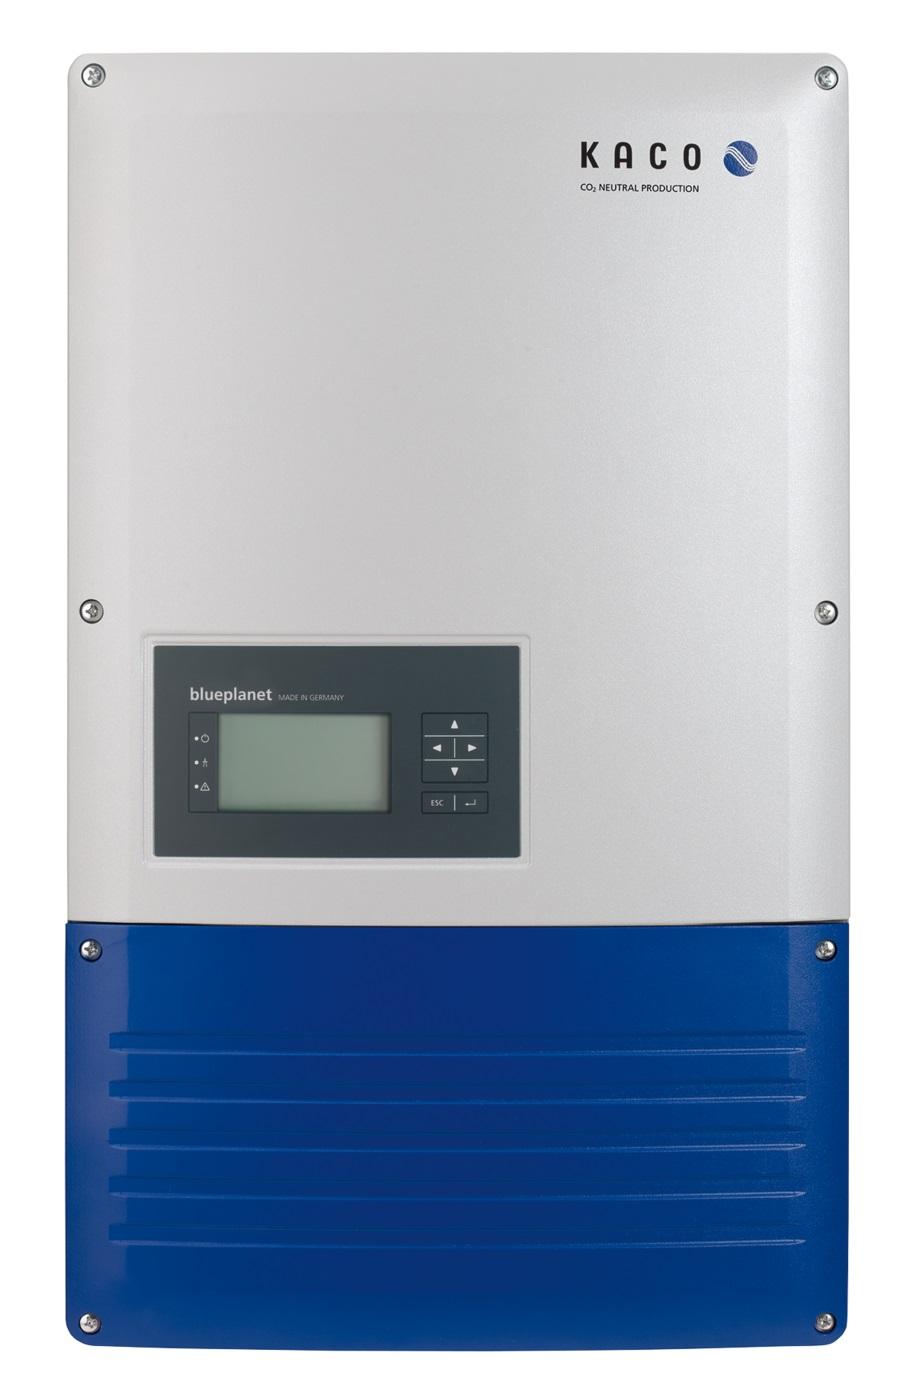 1 Stk Kaco blueplanet 20.0 TL3 3ph IP65 2 MPP-Tracker  PVI50200--